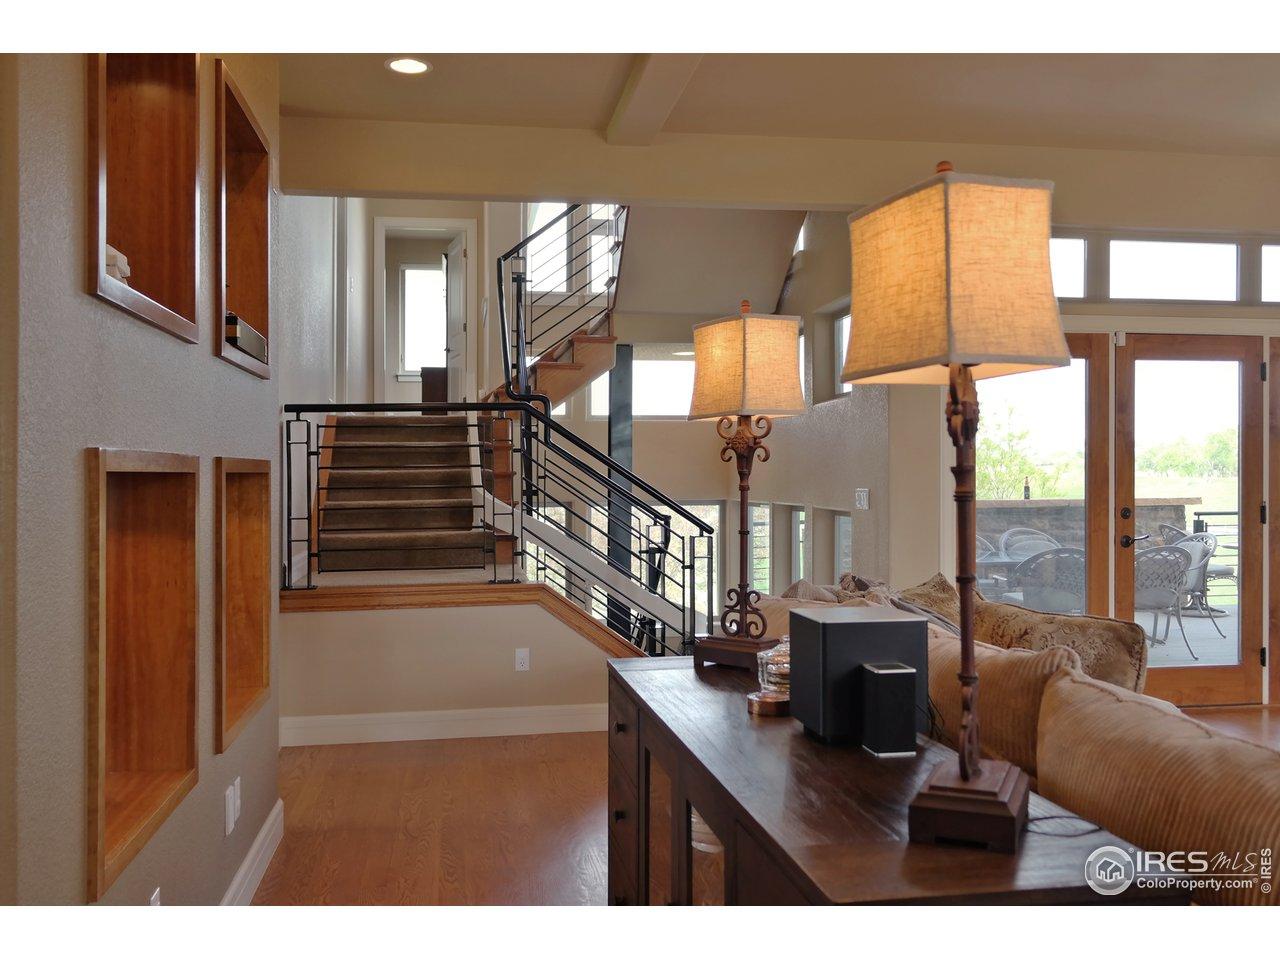 Exquisite Interior Layout w/Custom Windows Thruout